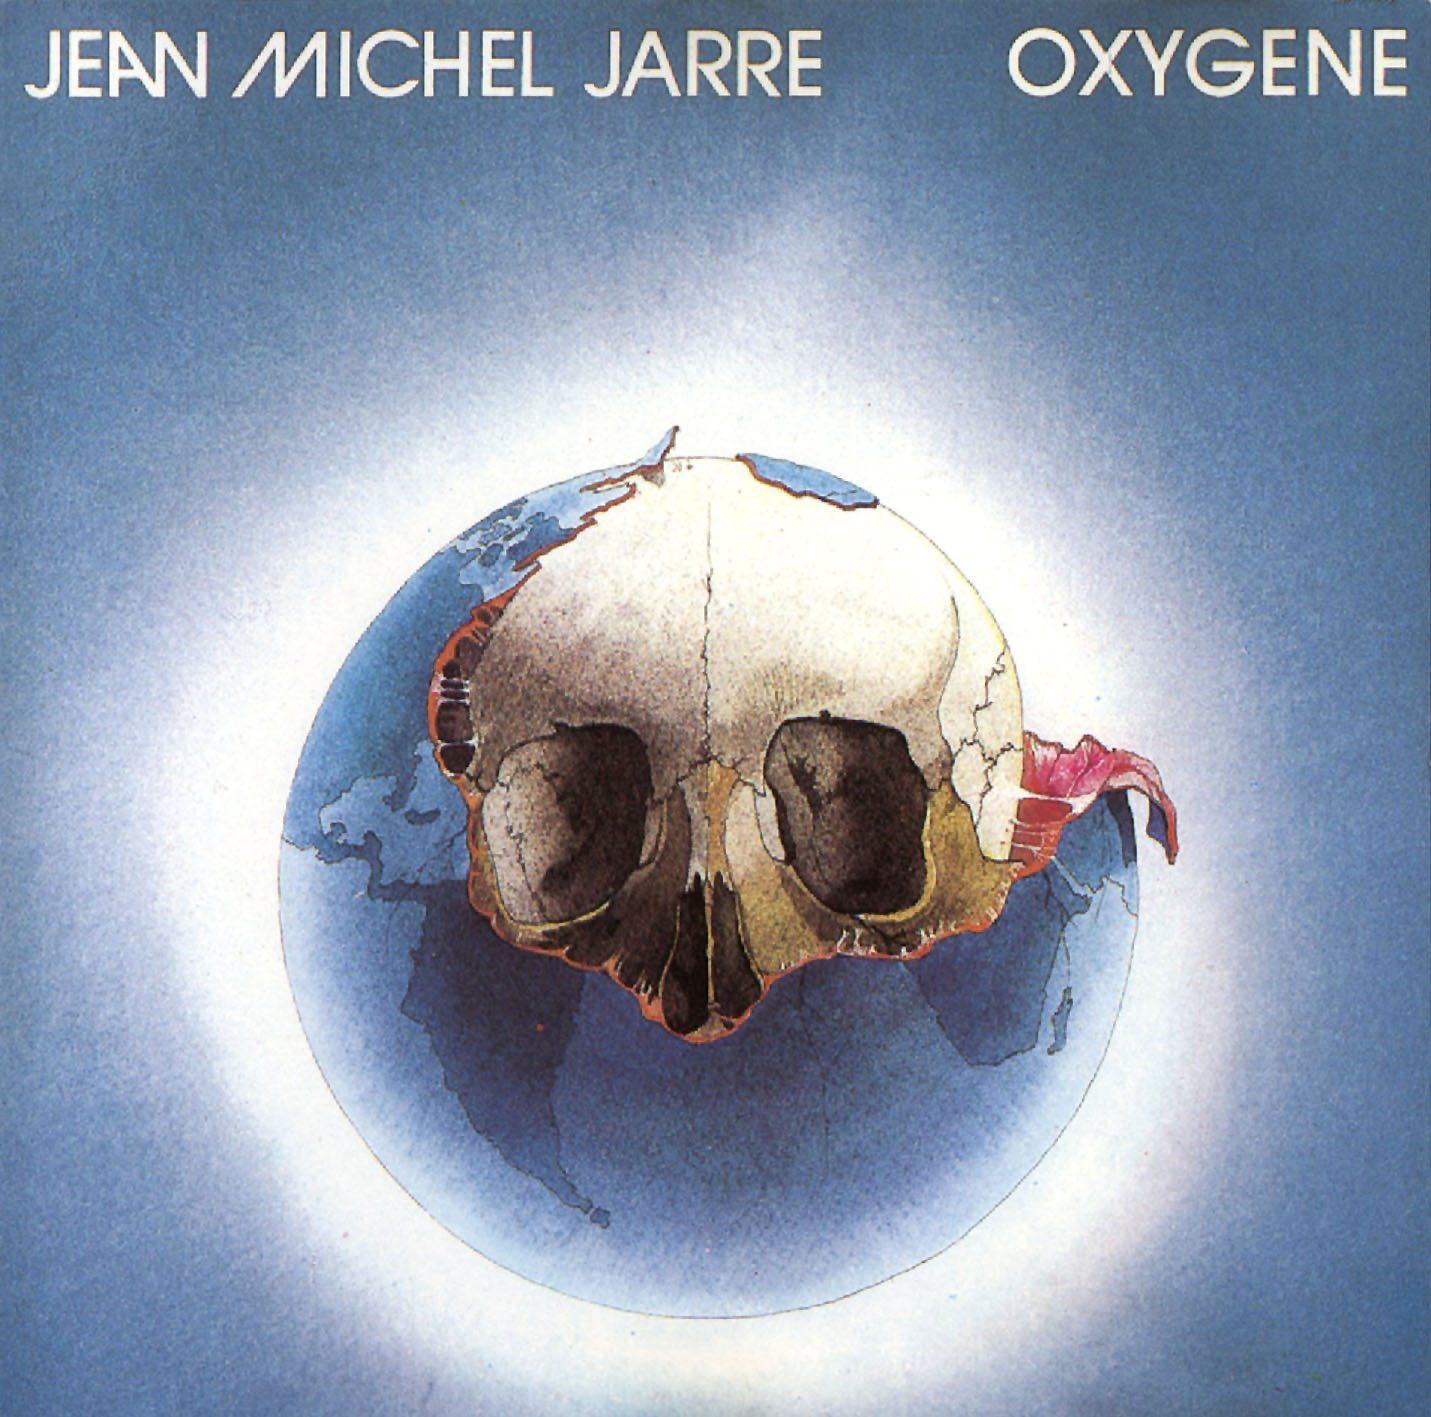 Jean Michel Jarre, Oxygene,Pierre Schaeffer, Gershon Kingsley,Kraftwerk, Takkyu Ishino, transmix, trance, hardcore, house, lounge, minimalisme, musique répétitive,